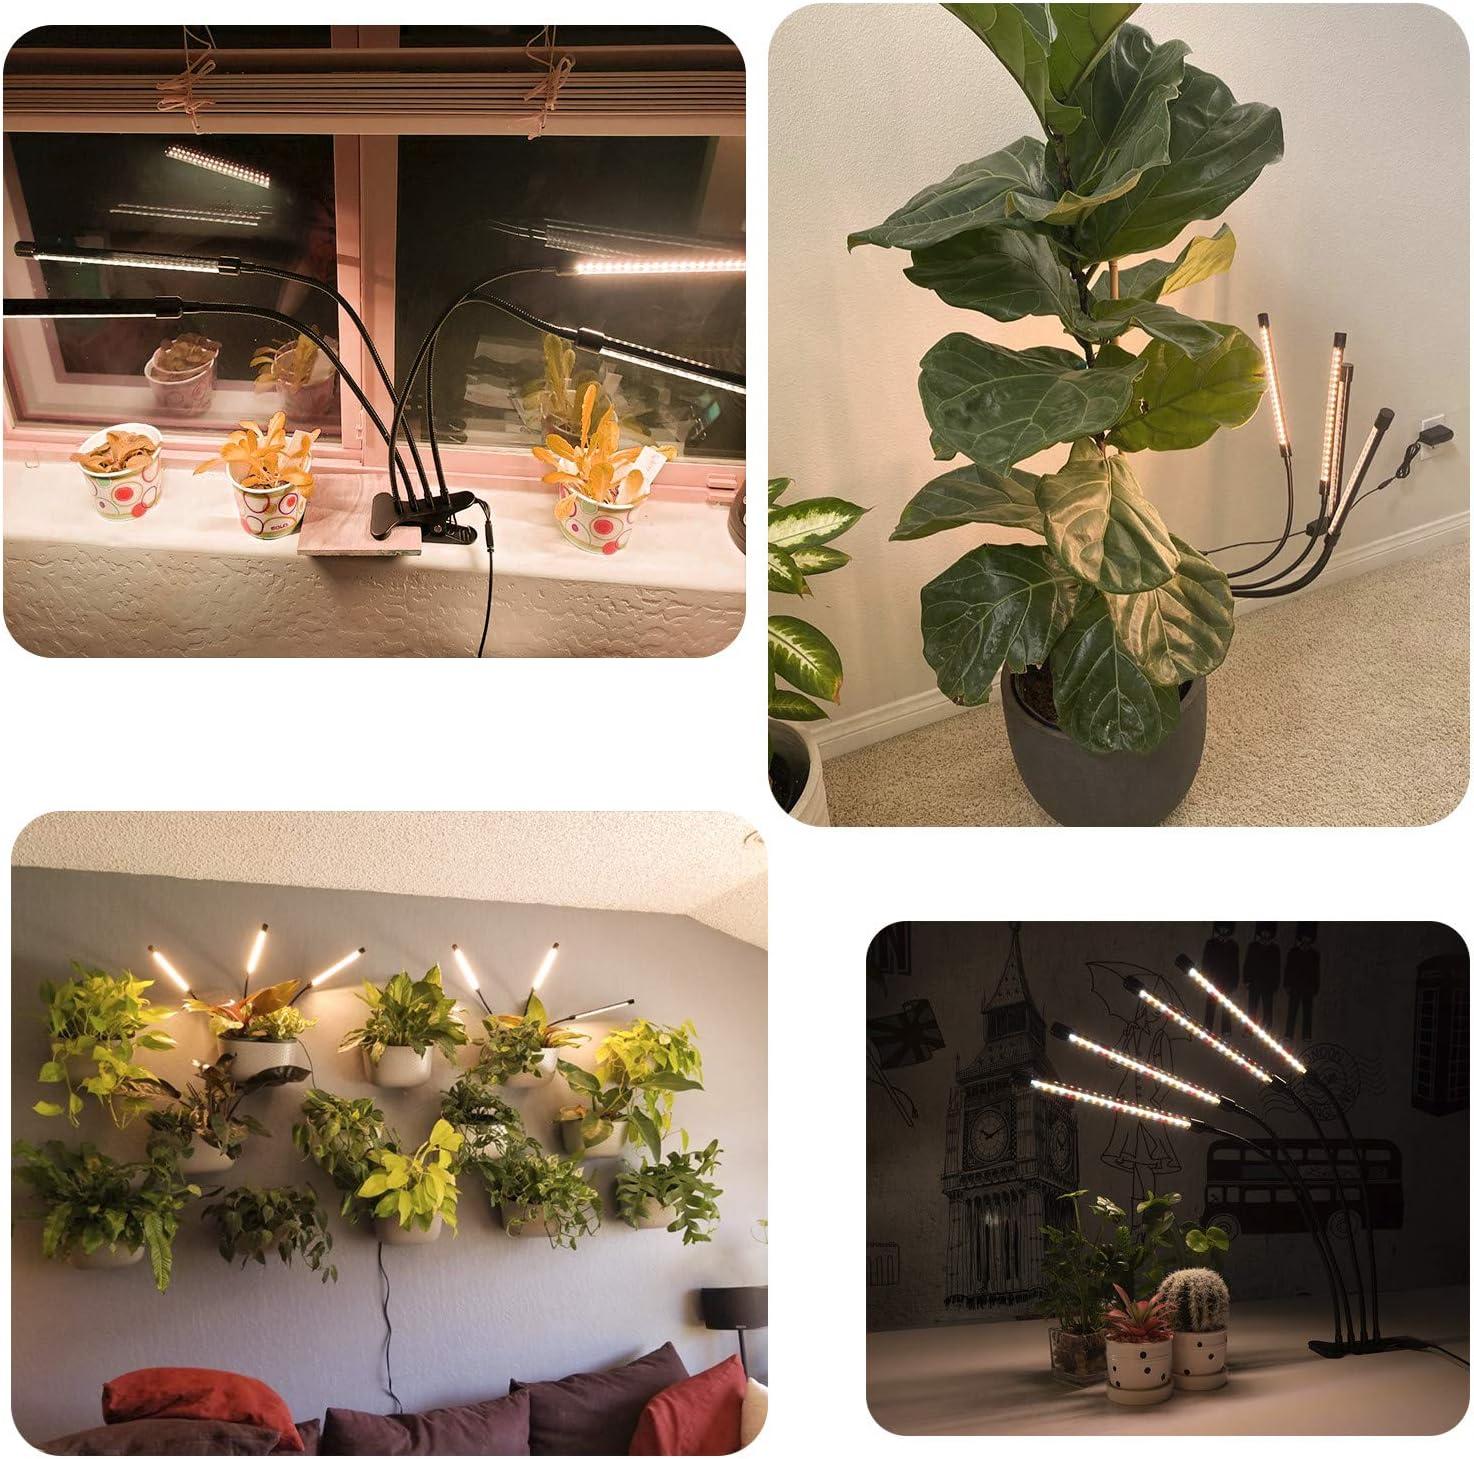 Garpsen L/ámpara Cultivo Interior L/ámpara de Crecimiento de 4 Cabezas con Temporizador para Semillas Jardiner/ía Bonsai 660nm//3000K//5000K 80 LEDs Espectro Completo Led L/ámpara de Plantas